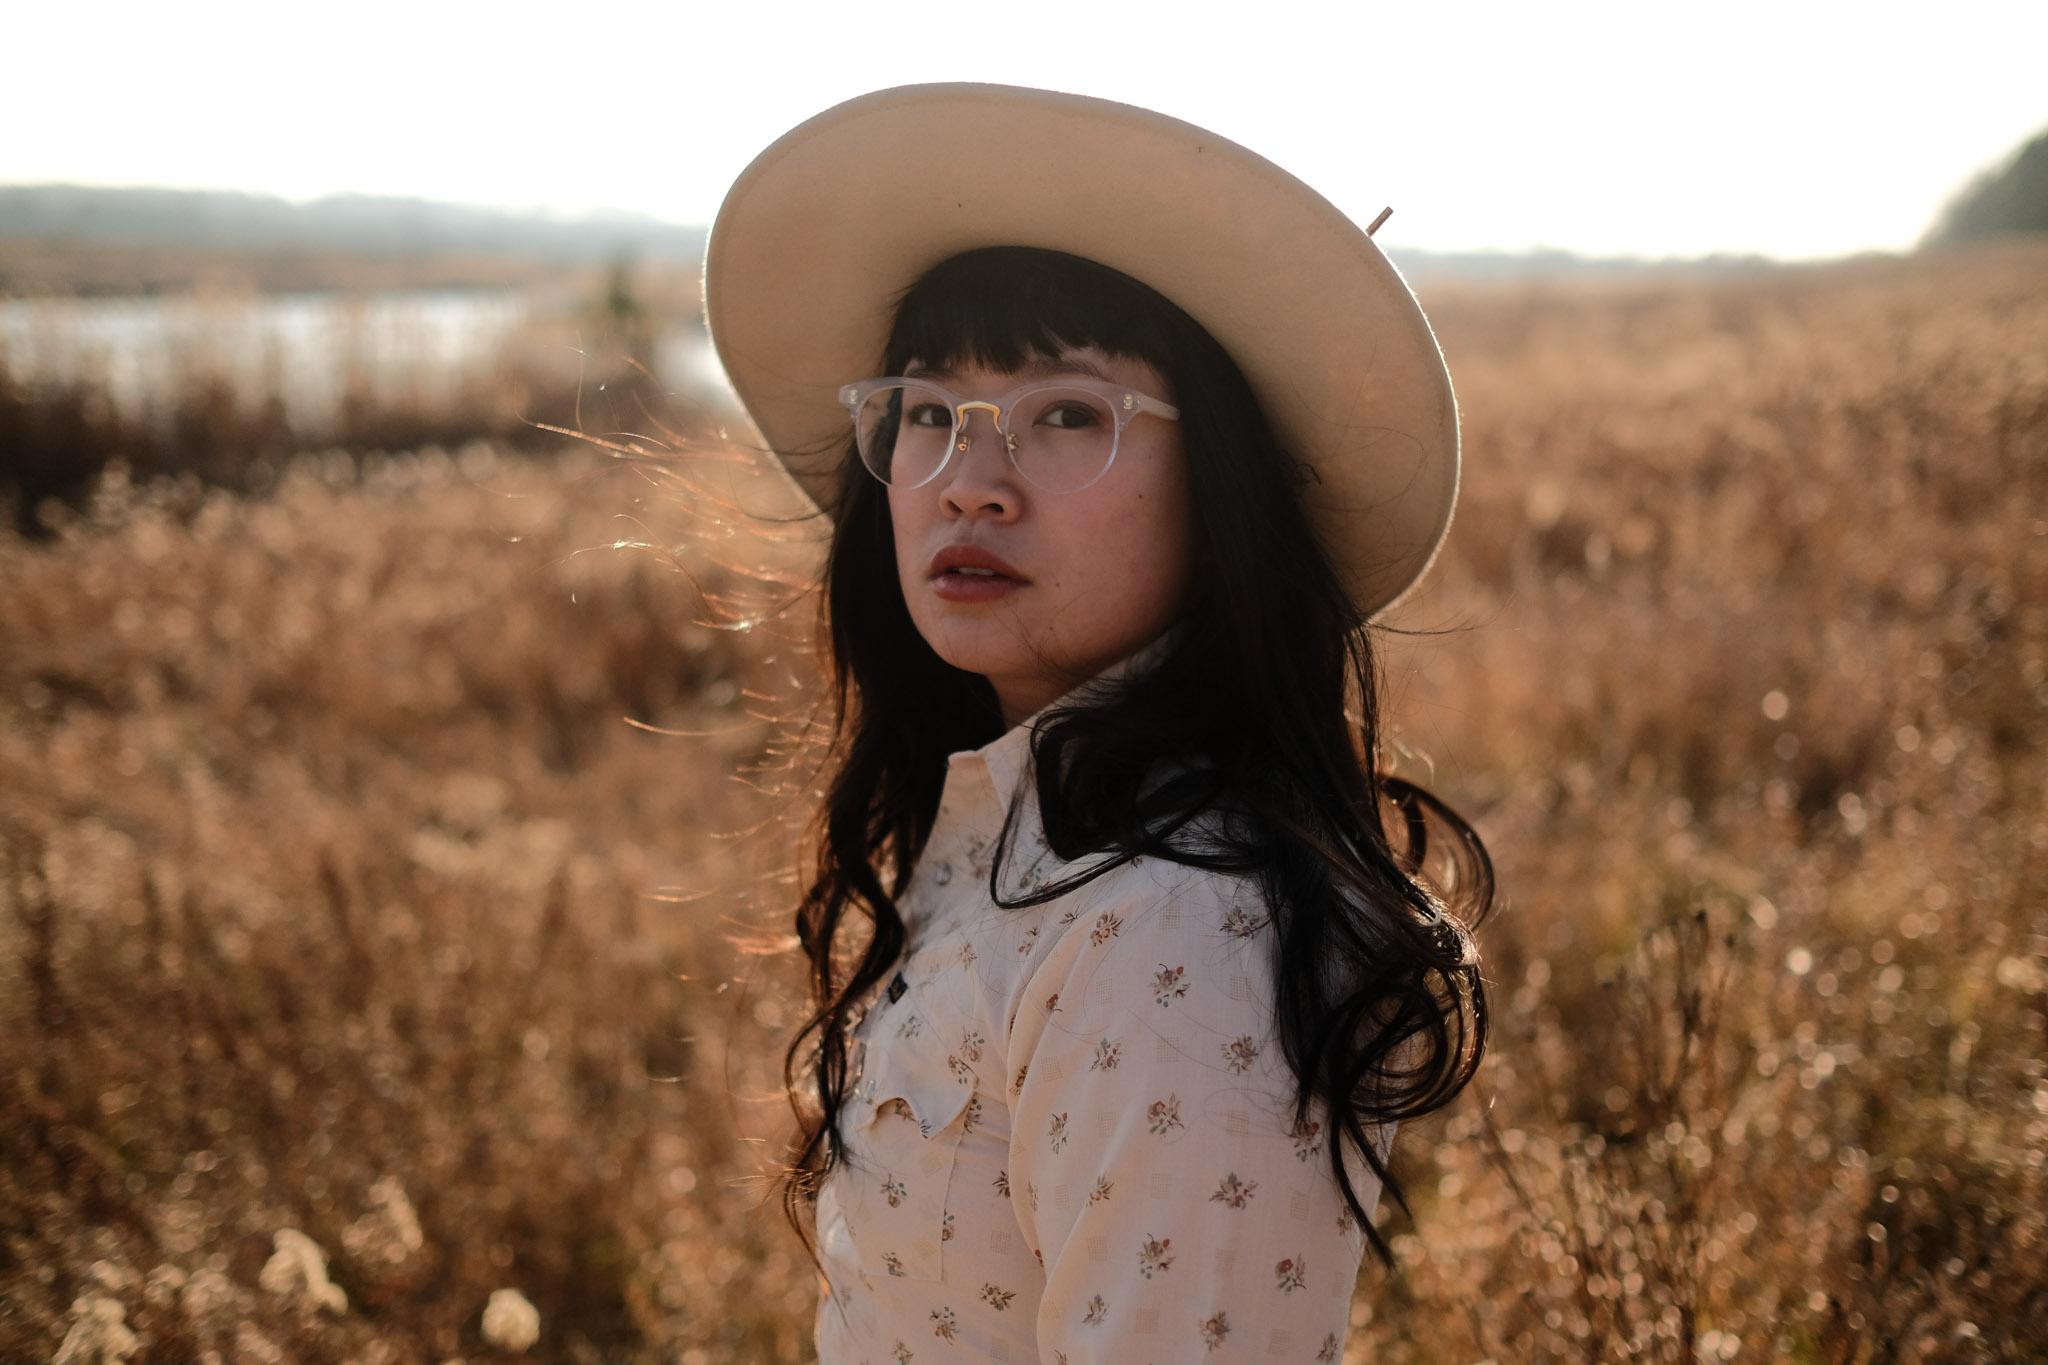 Nicolette Hoang